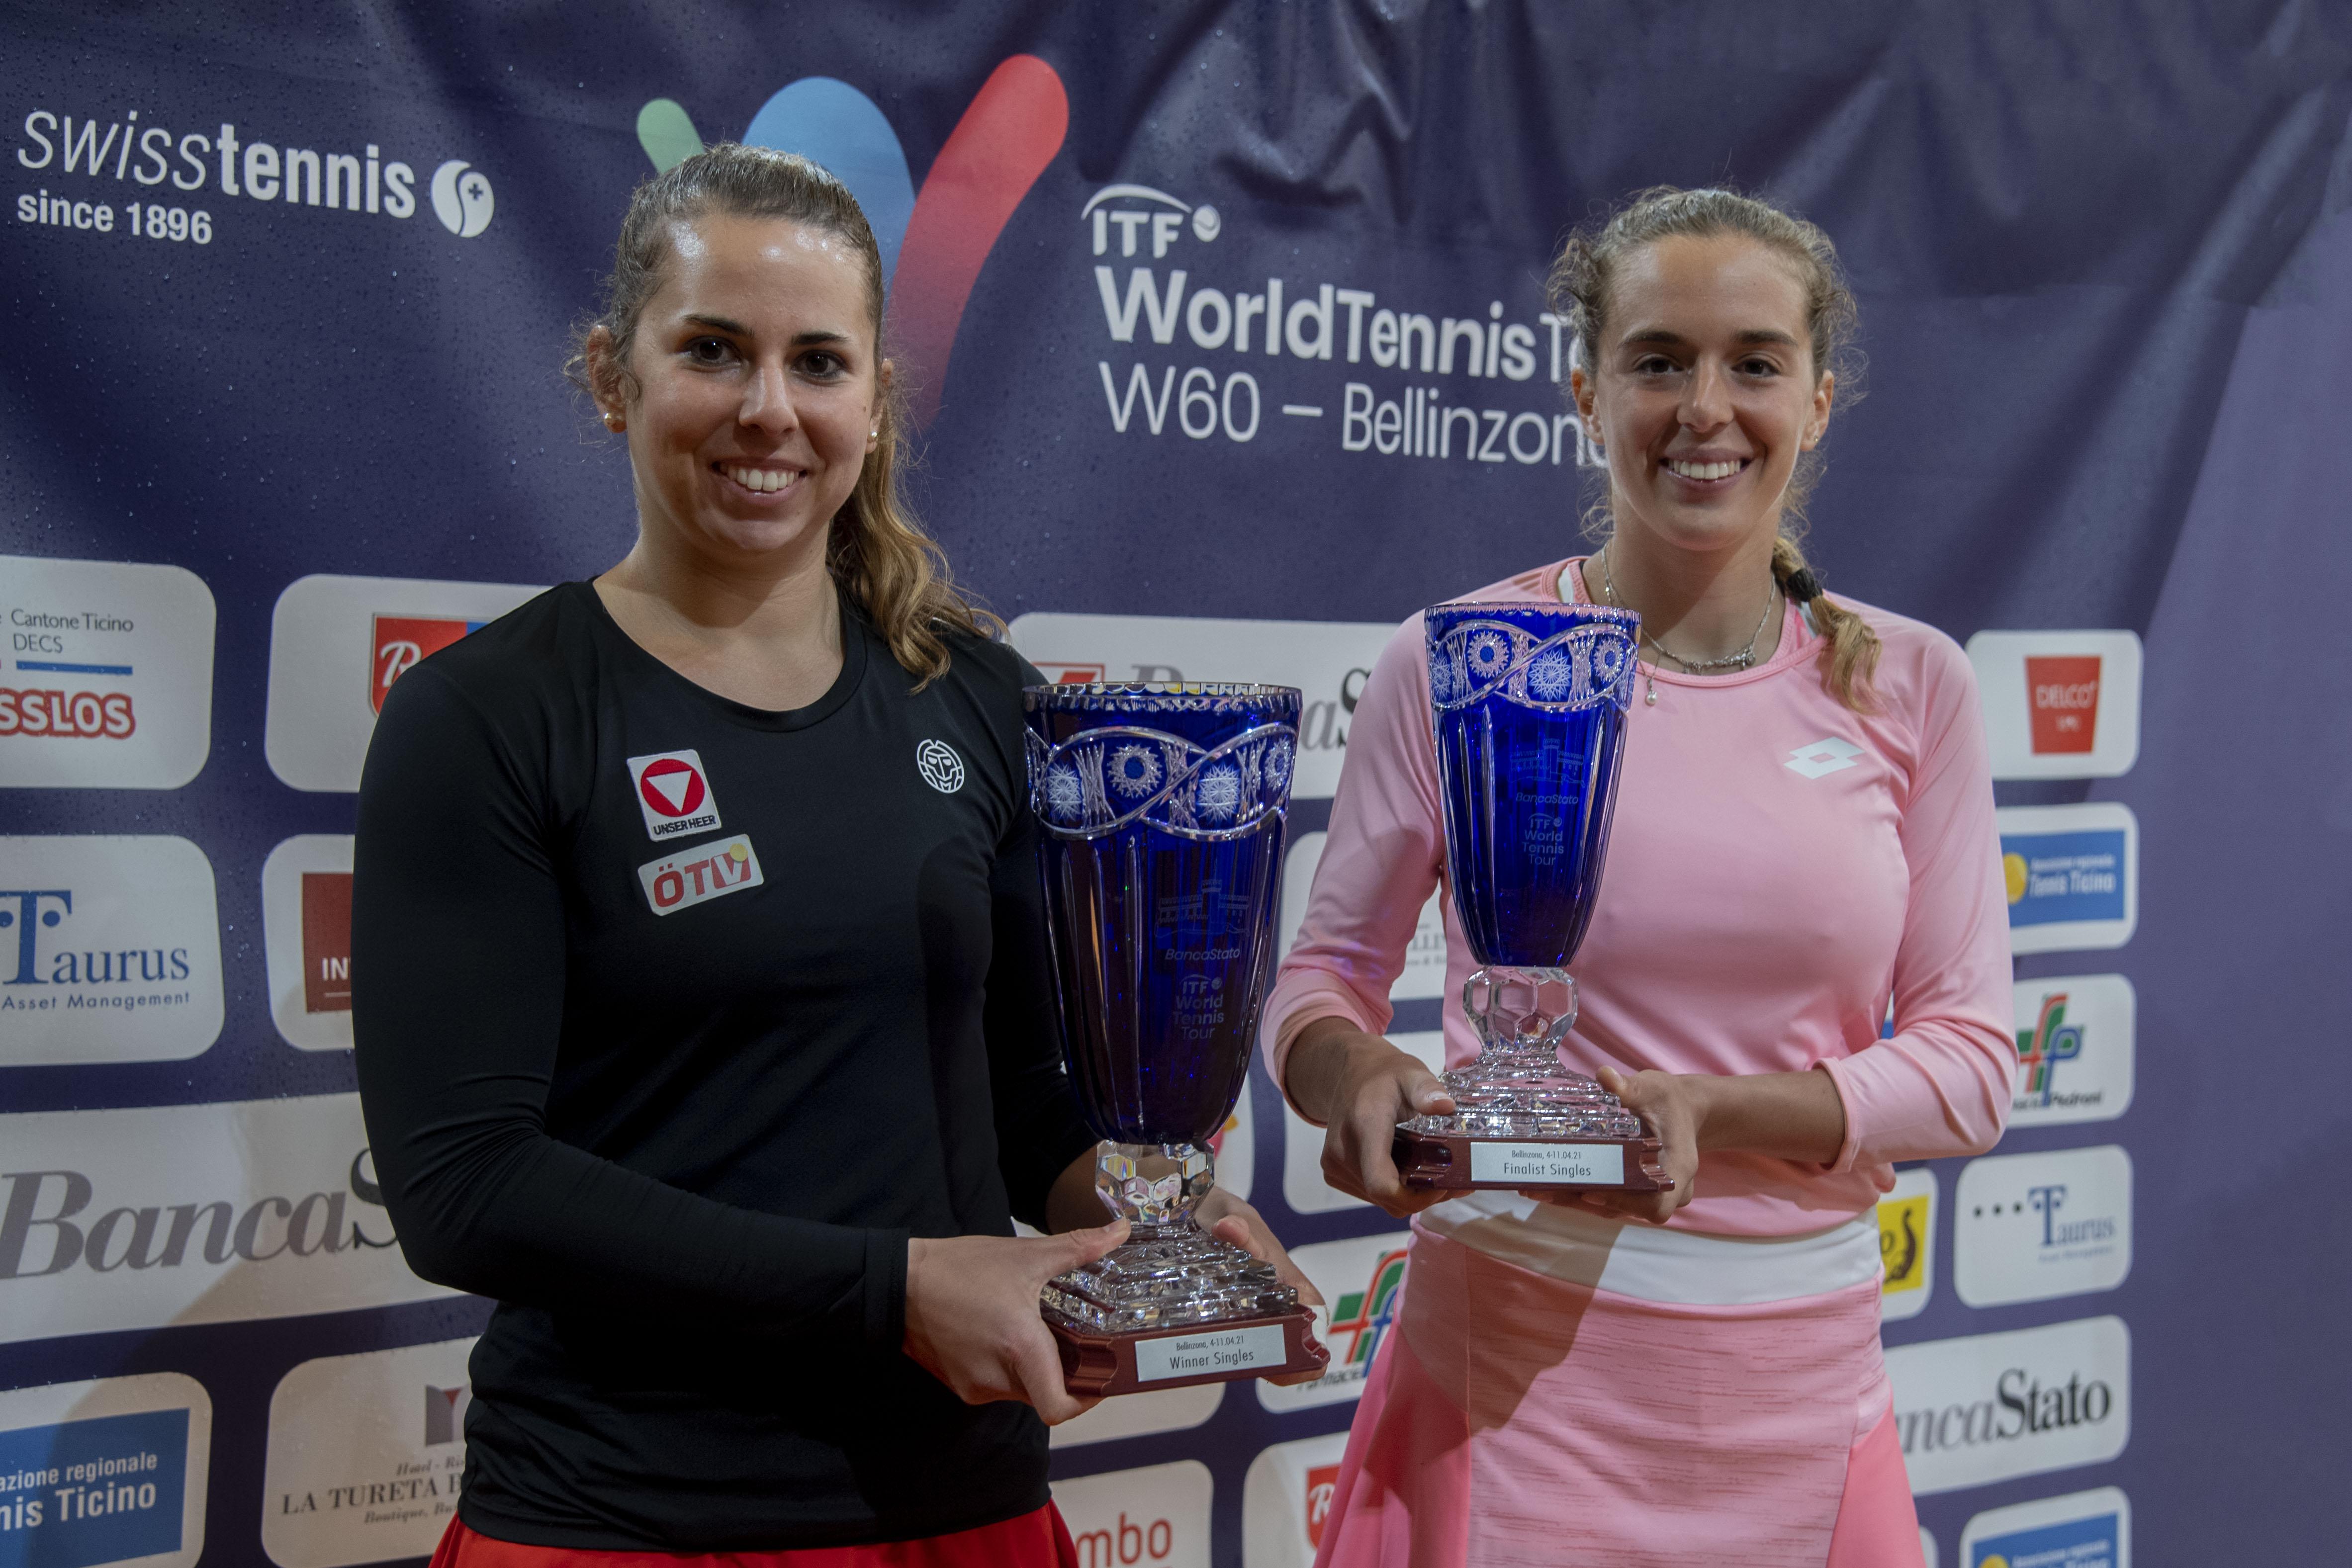 2021.04.11-ITF-WorldTennisTour-Final-Award-Ceremony-GrabherAUT-Bronzetti-ITA-04